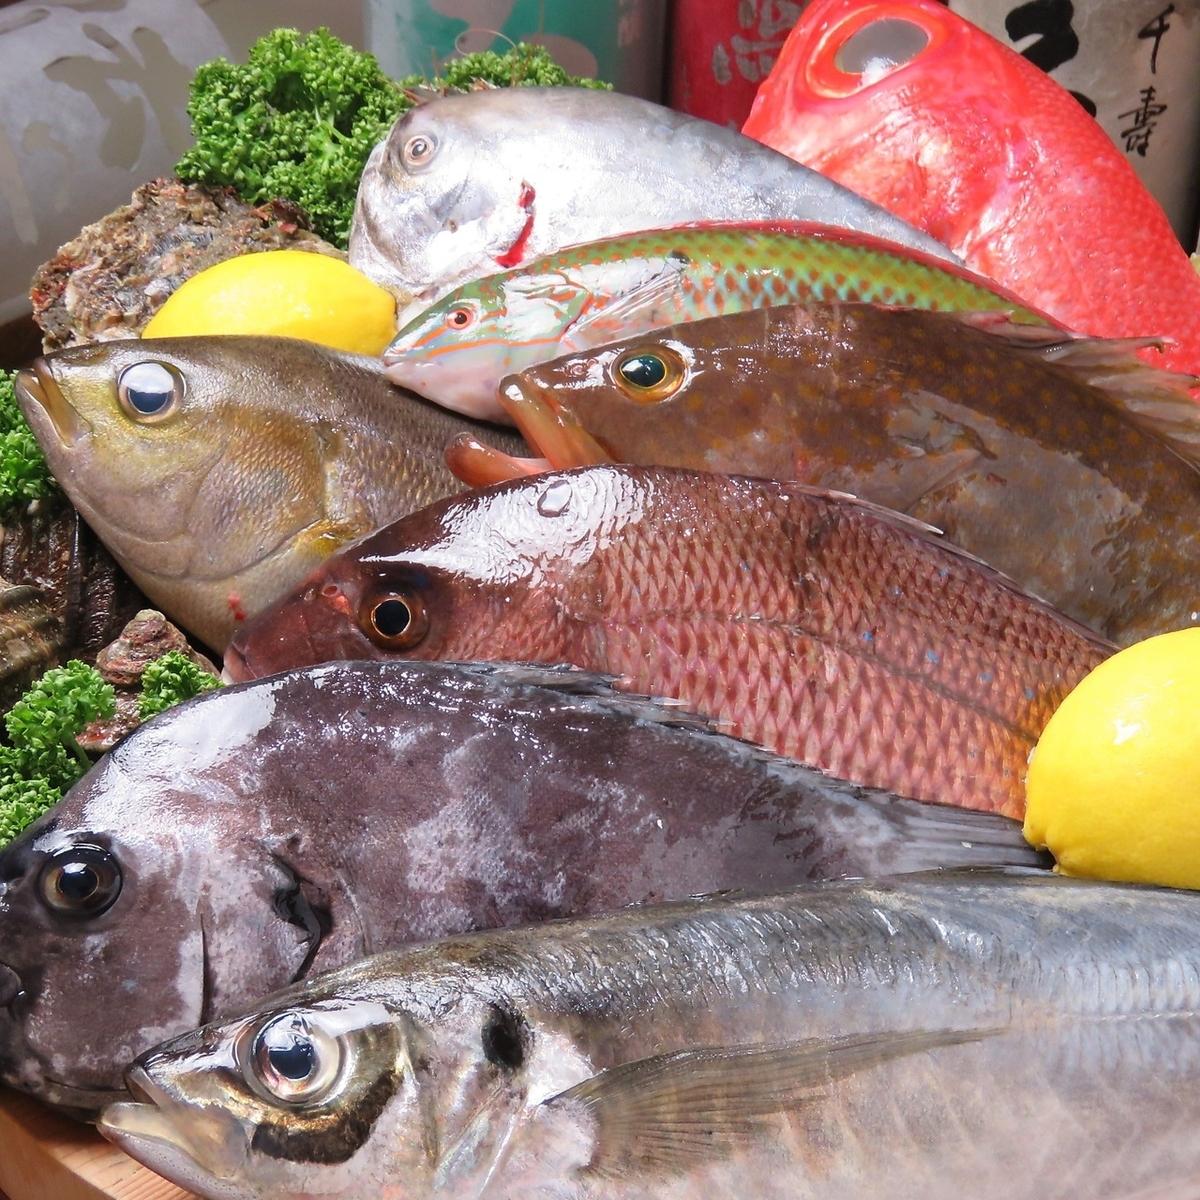 Eat carefully selected fish